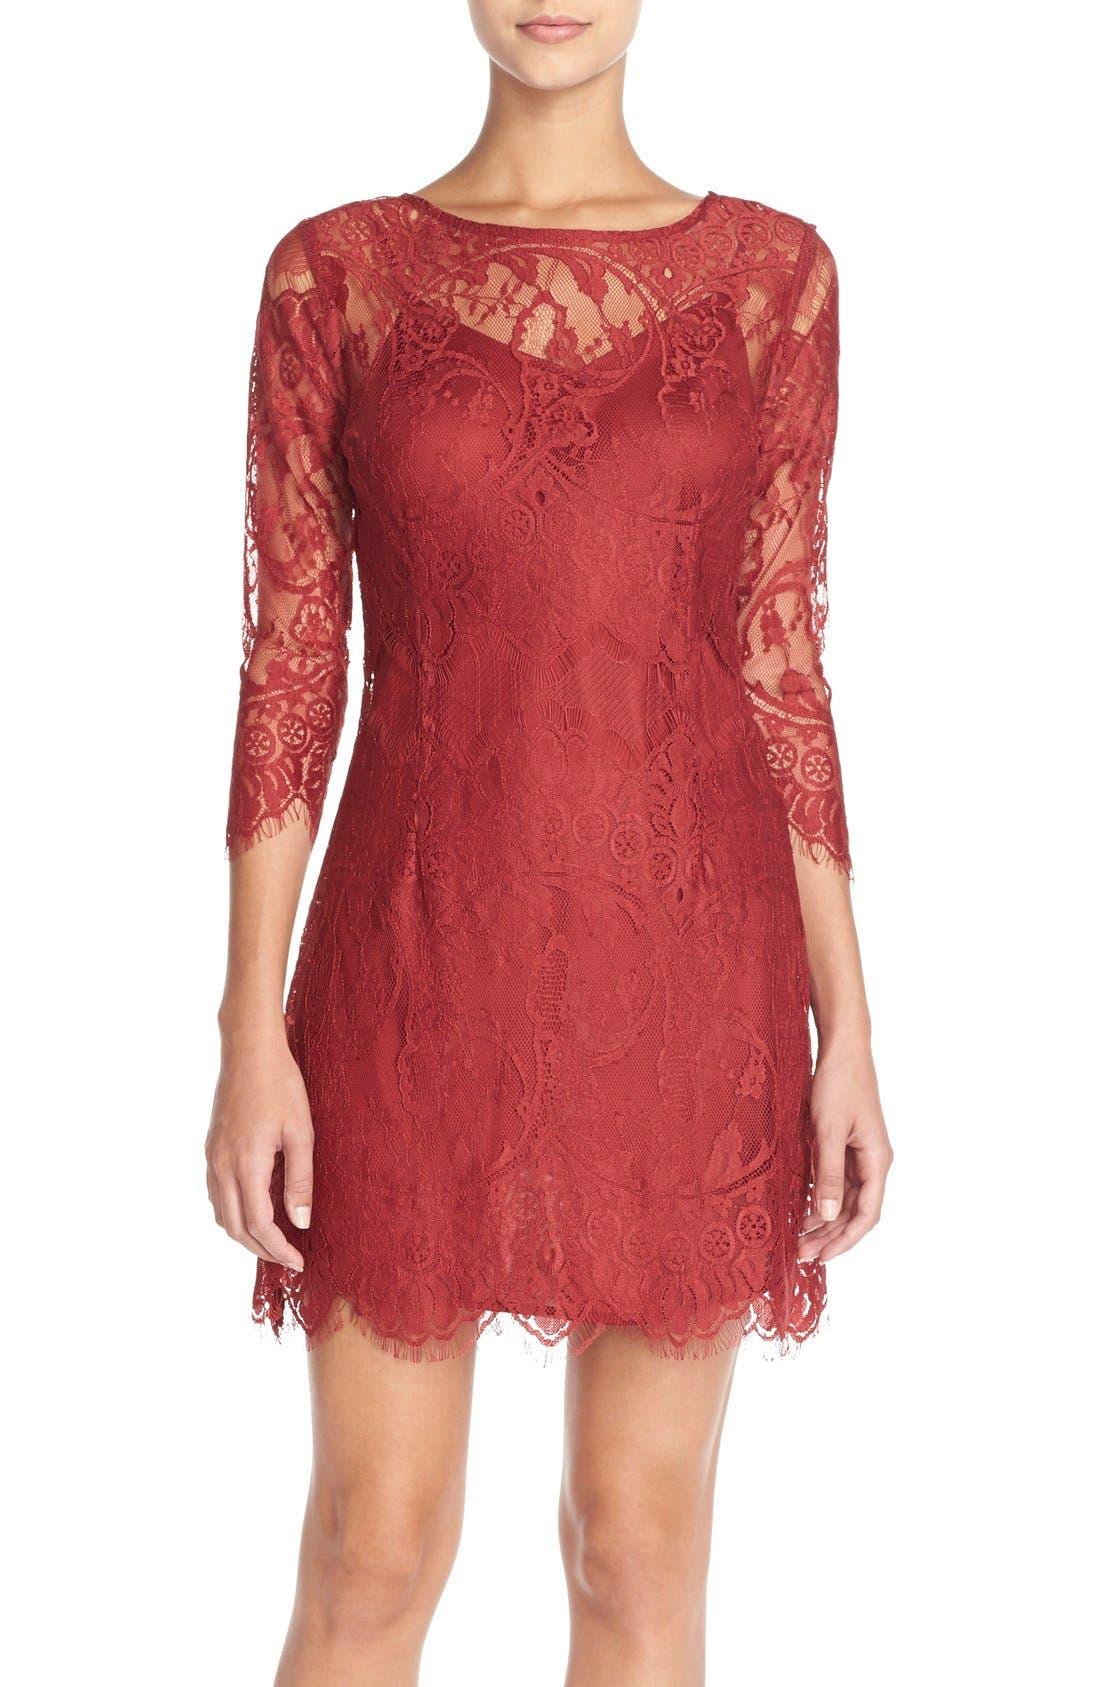 Alternate Image 1 Selected - BB Dakota 'Natalia' Lace Sheath Dress